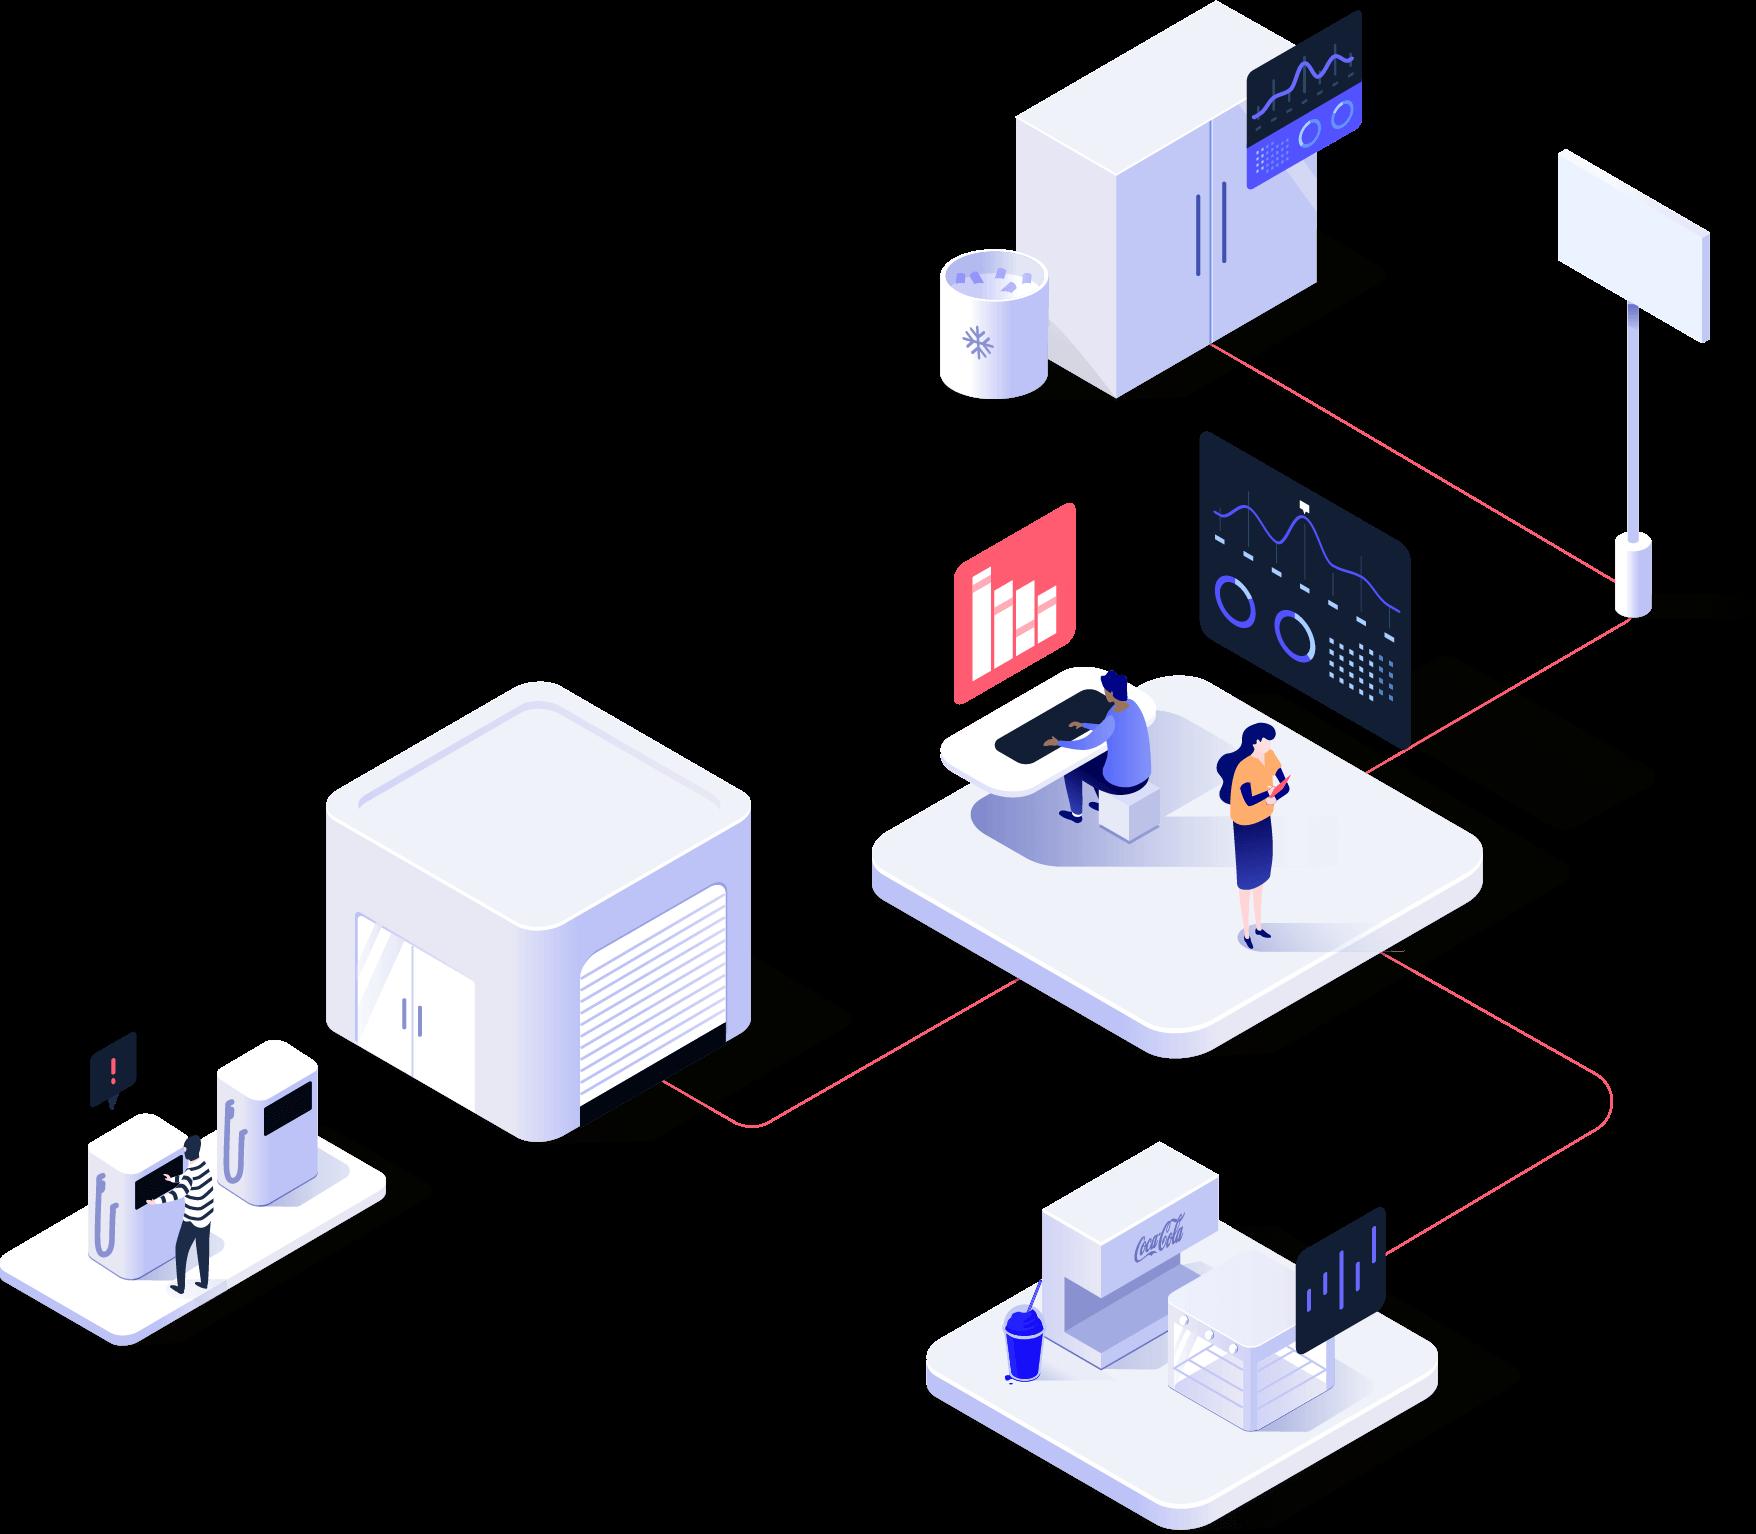 smart c-store